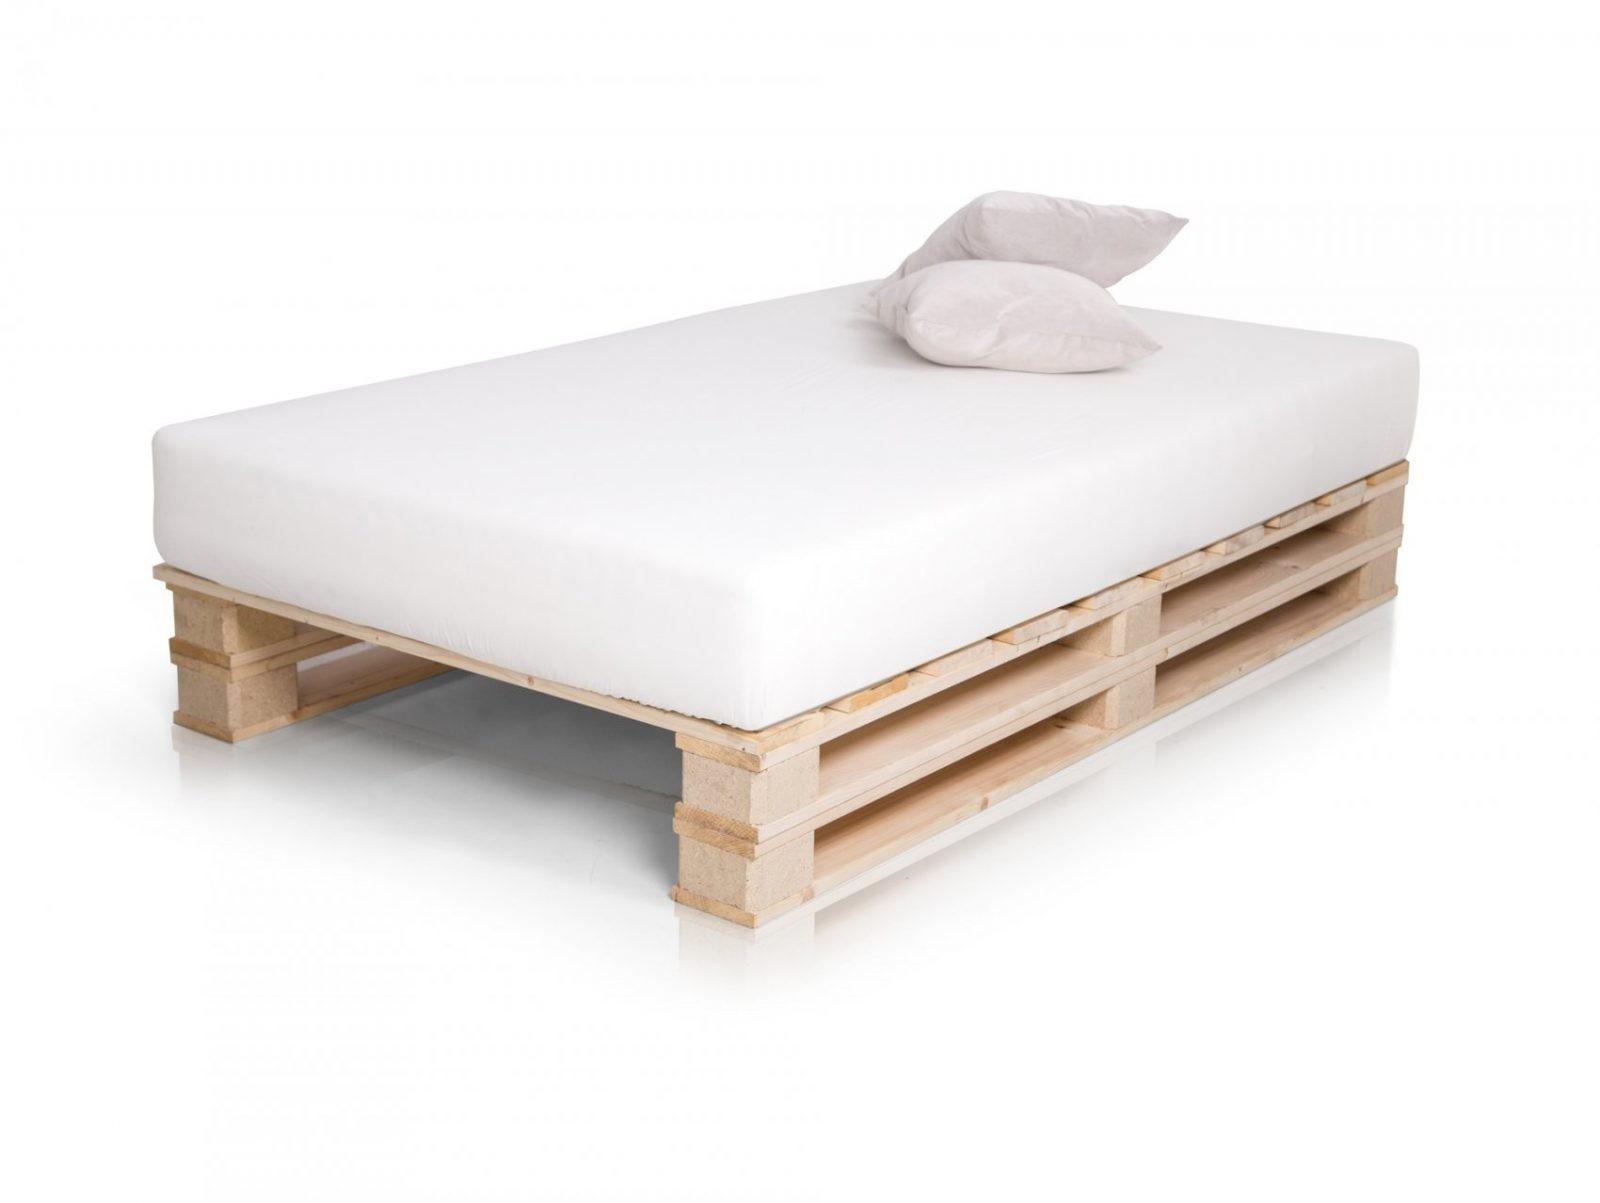 Doppelbett Holzbett Palettenbett Bett 120X200 Cm Jugendbett Paletti von Paletten Bett 120X200 Bild